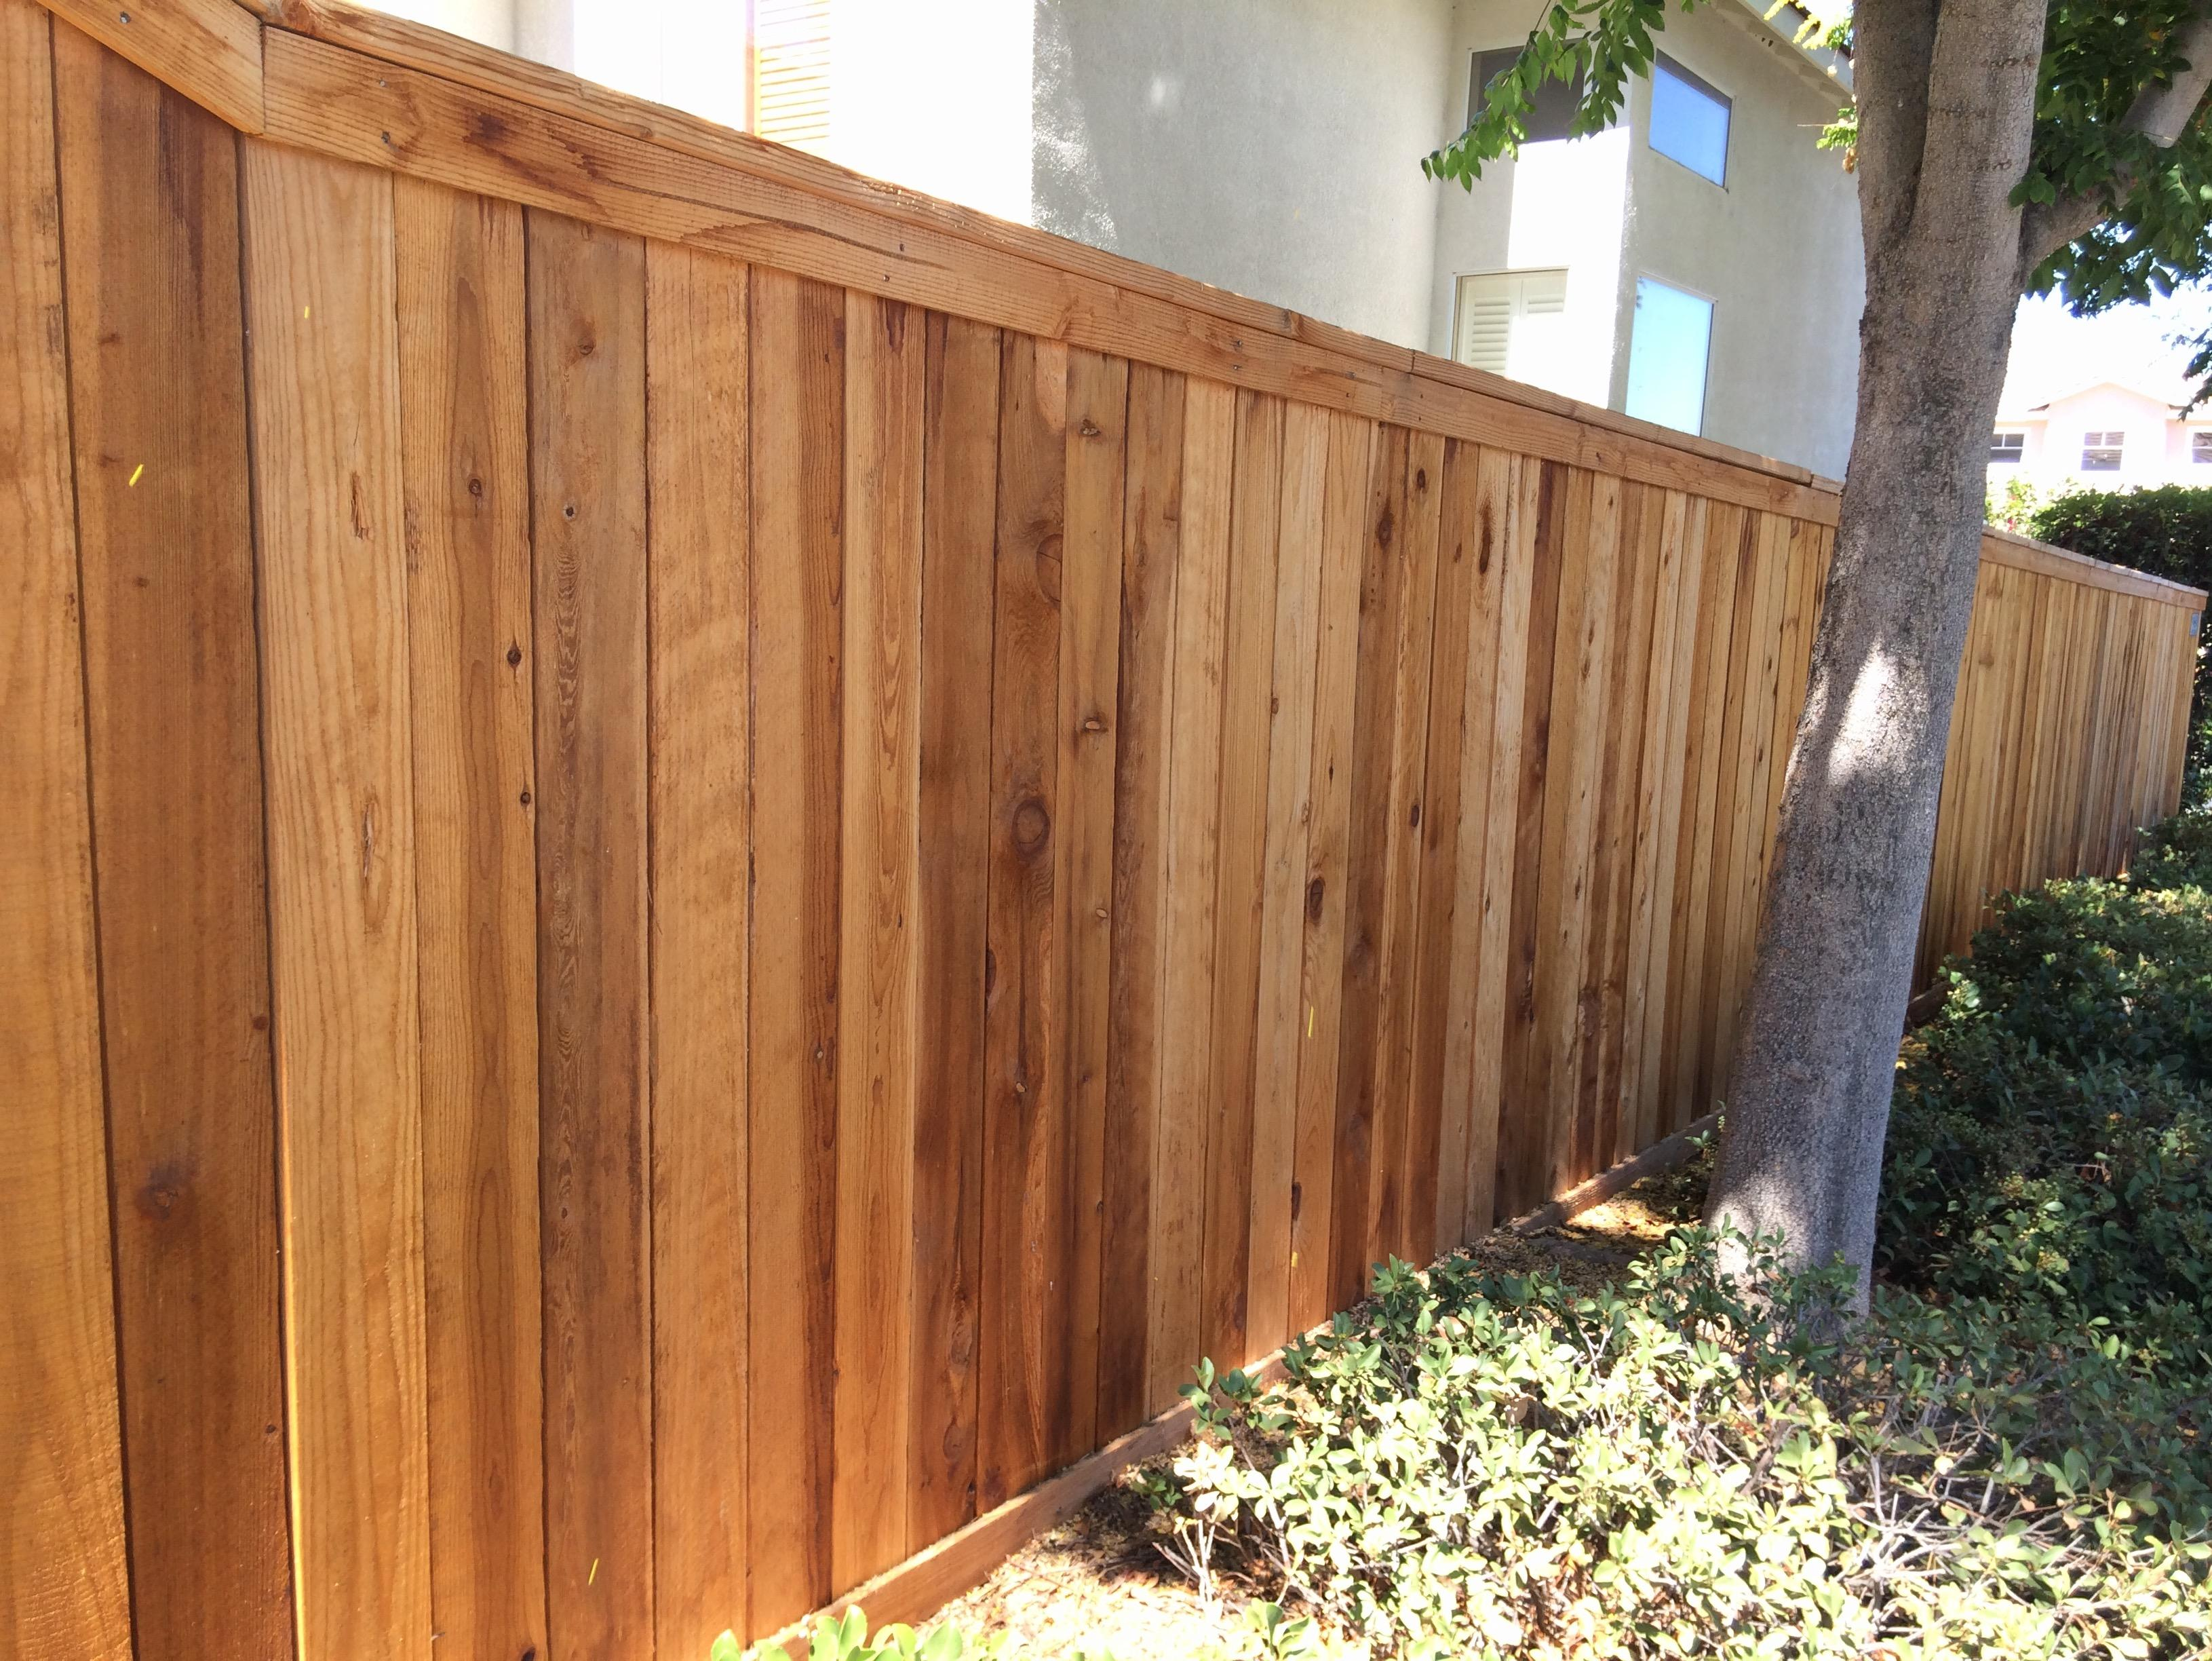 3T Fence image 8